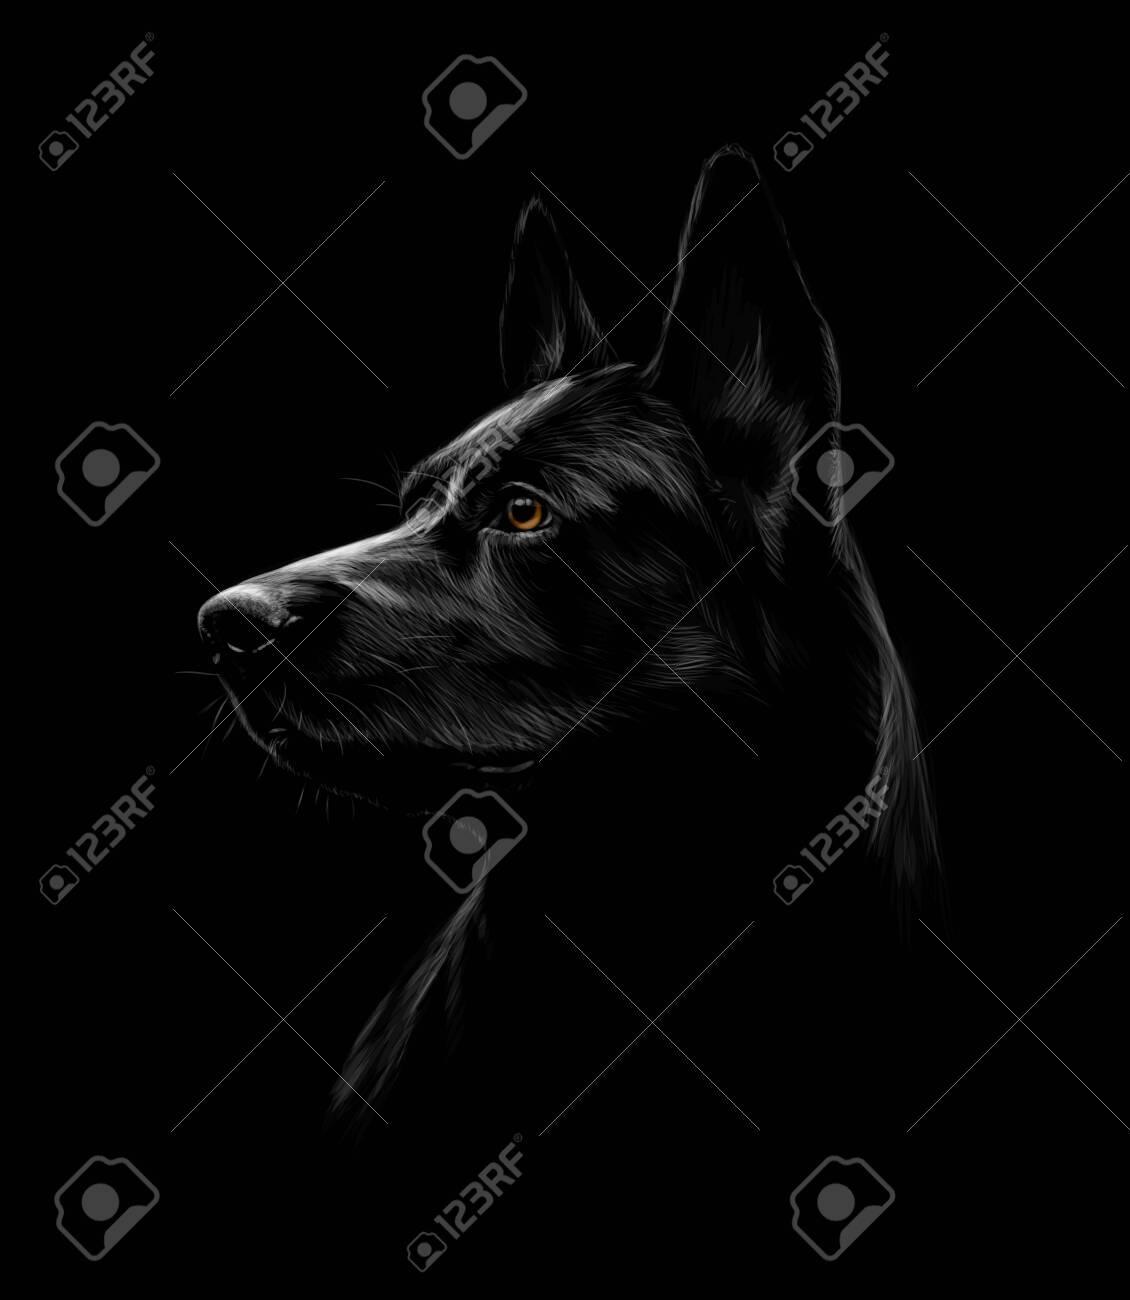 Portrait of a black shepherd dog on a black background - 122572889